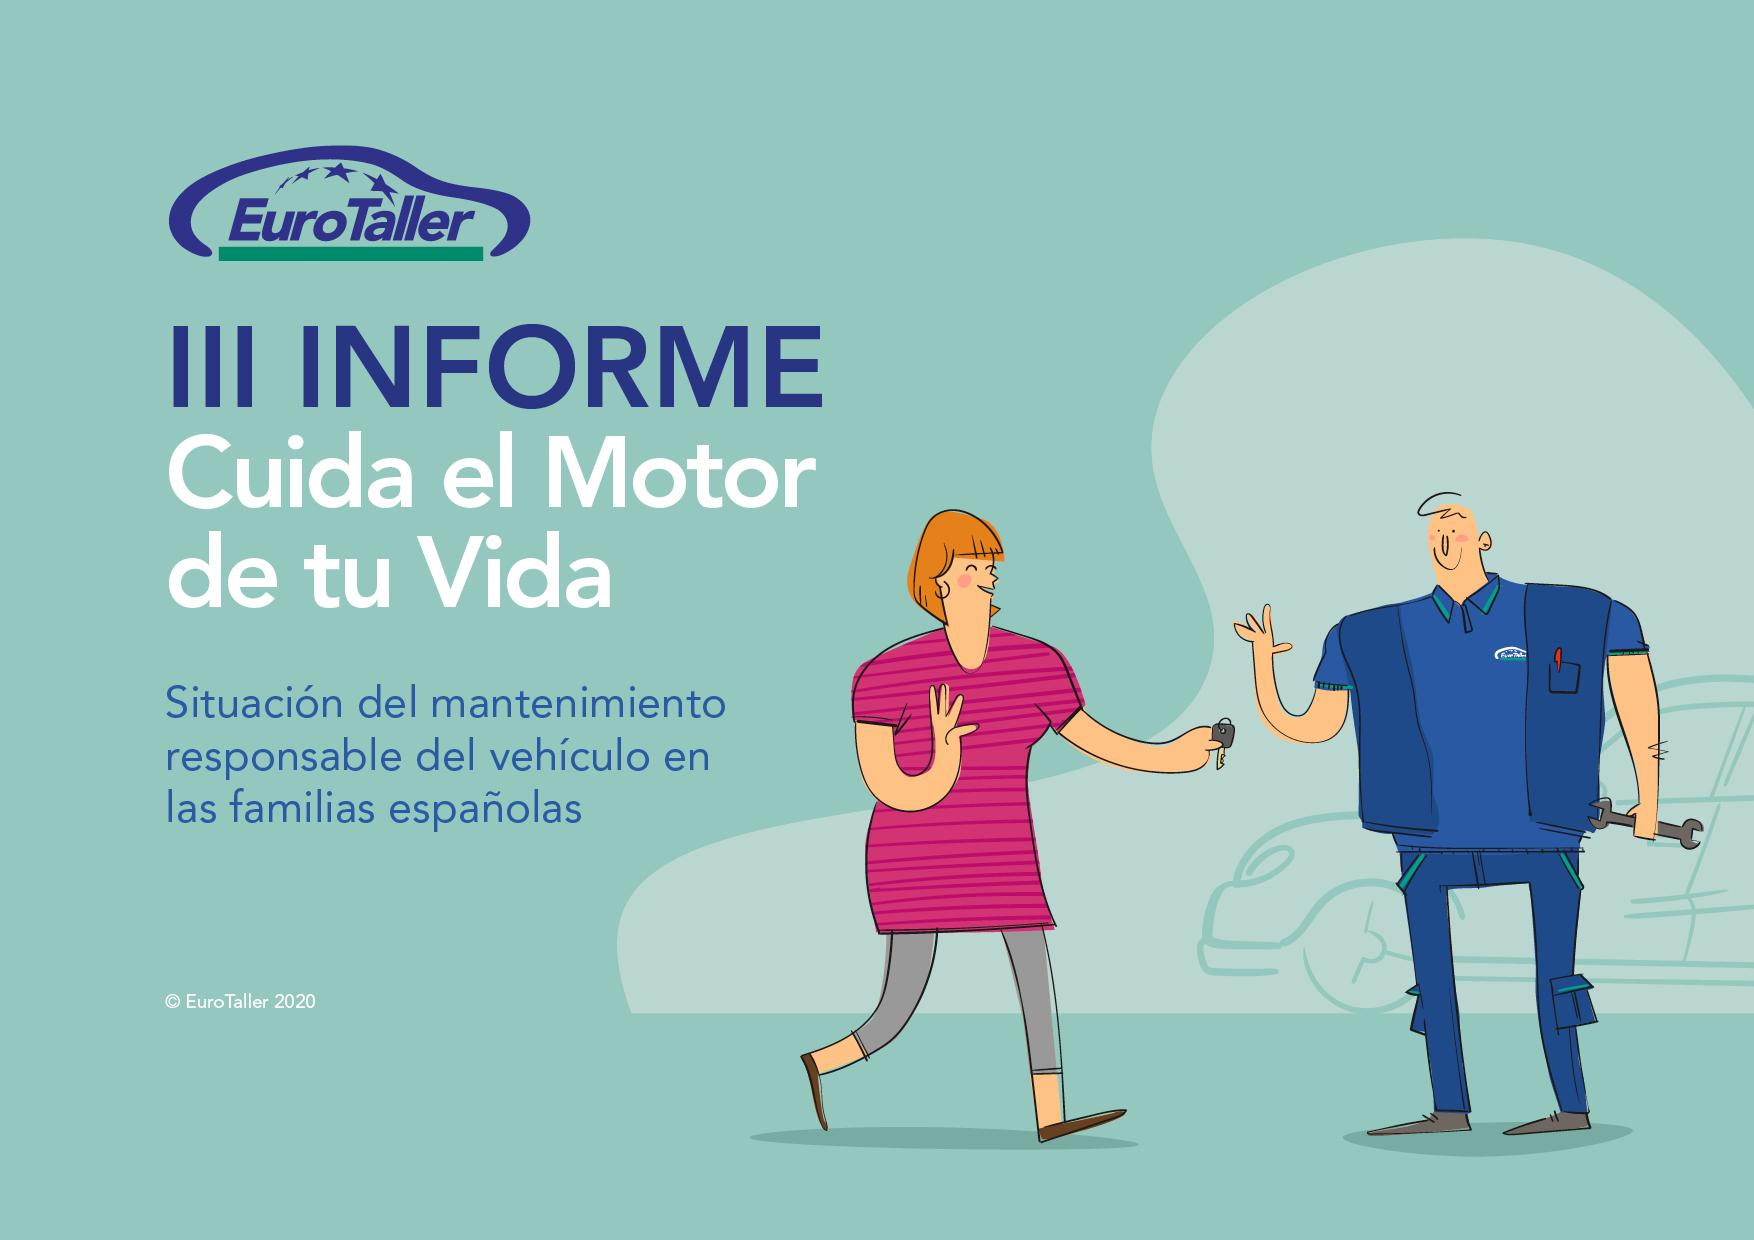 III Informe EuroTaller Cuida el Motor de tu Vida